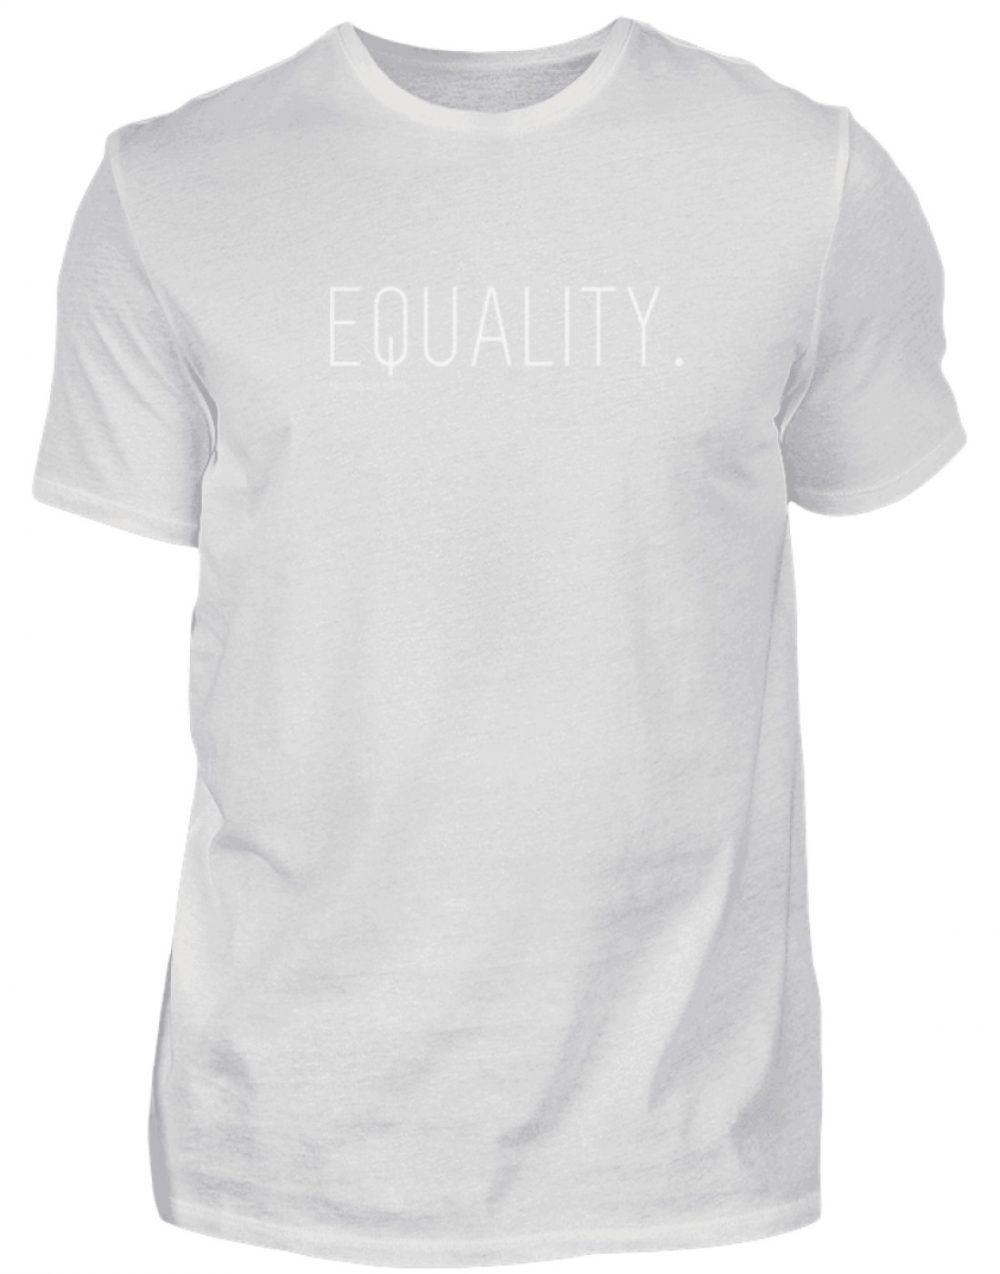 EQUALITY. - Herren Premiumshirt-1053